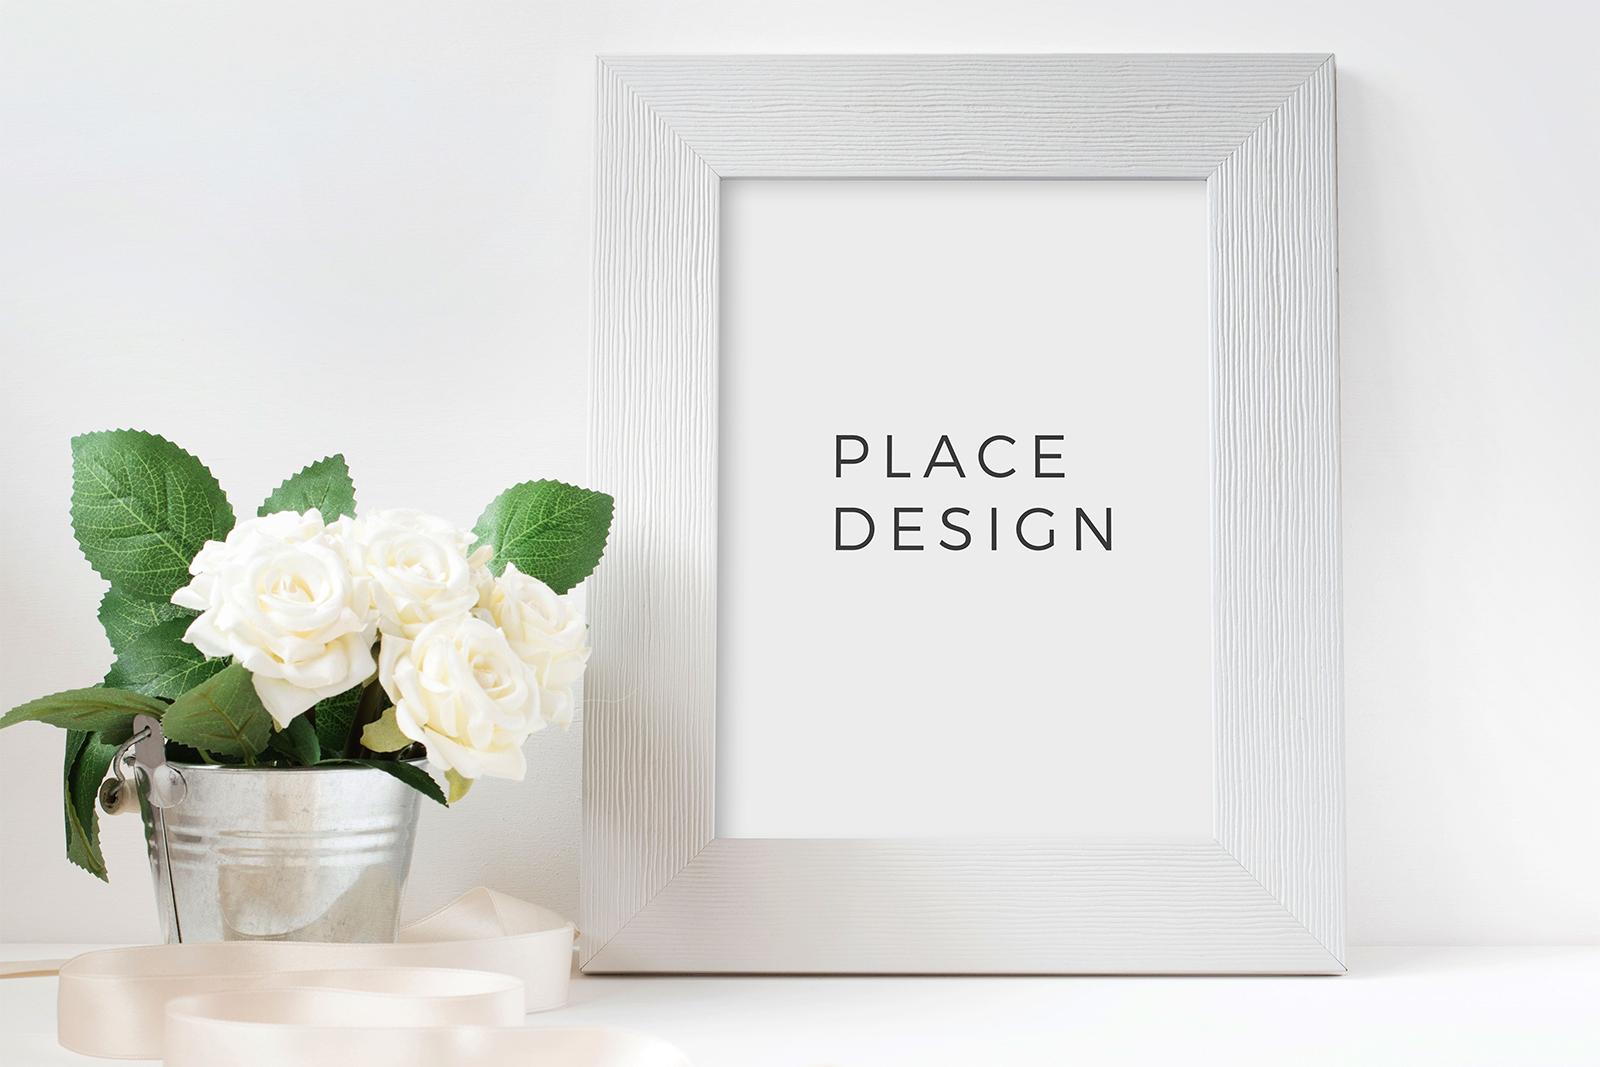 Elegant Photo Frame / Poster Mockup PSD